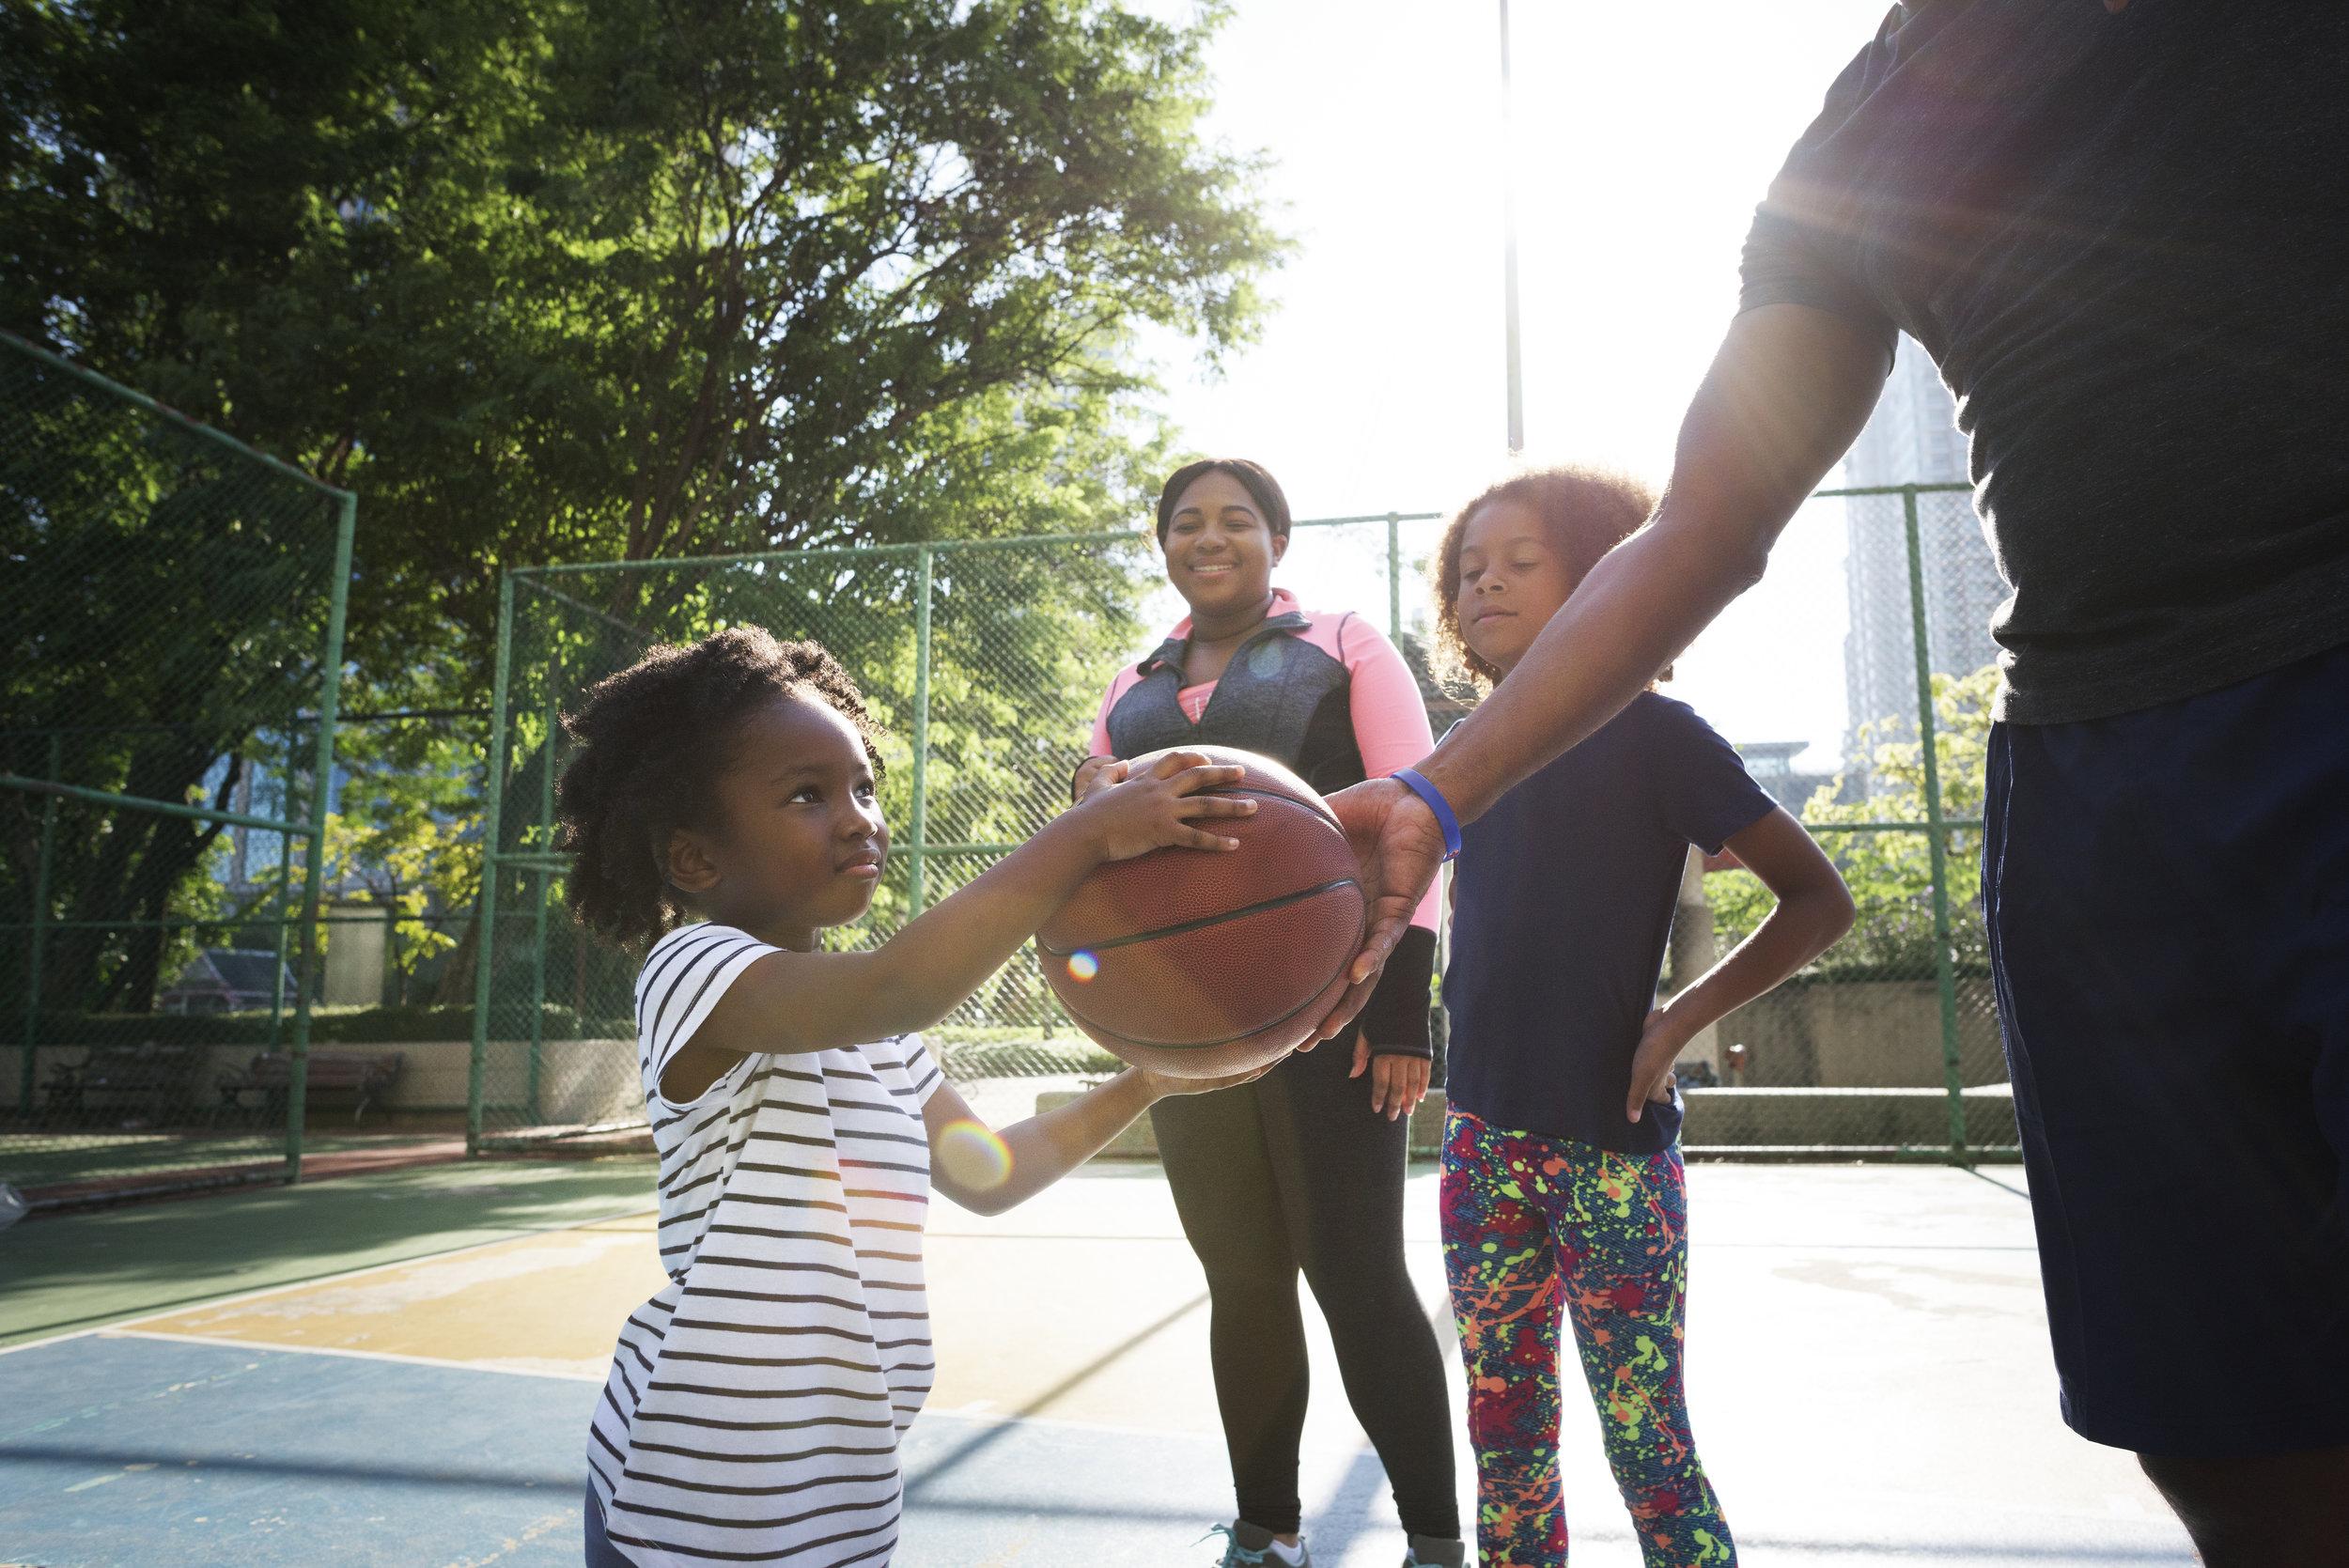 basketball-sport-exercise-activity-leisure-PEEHSN4.jpg